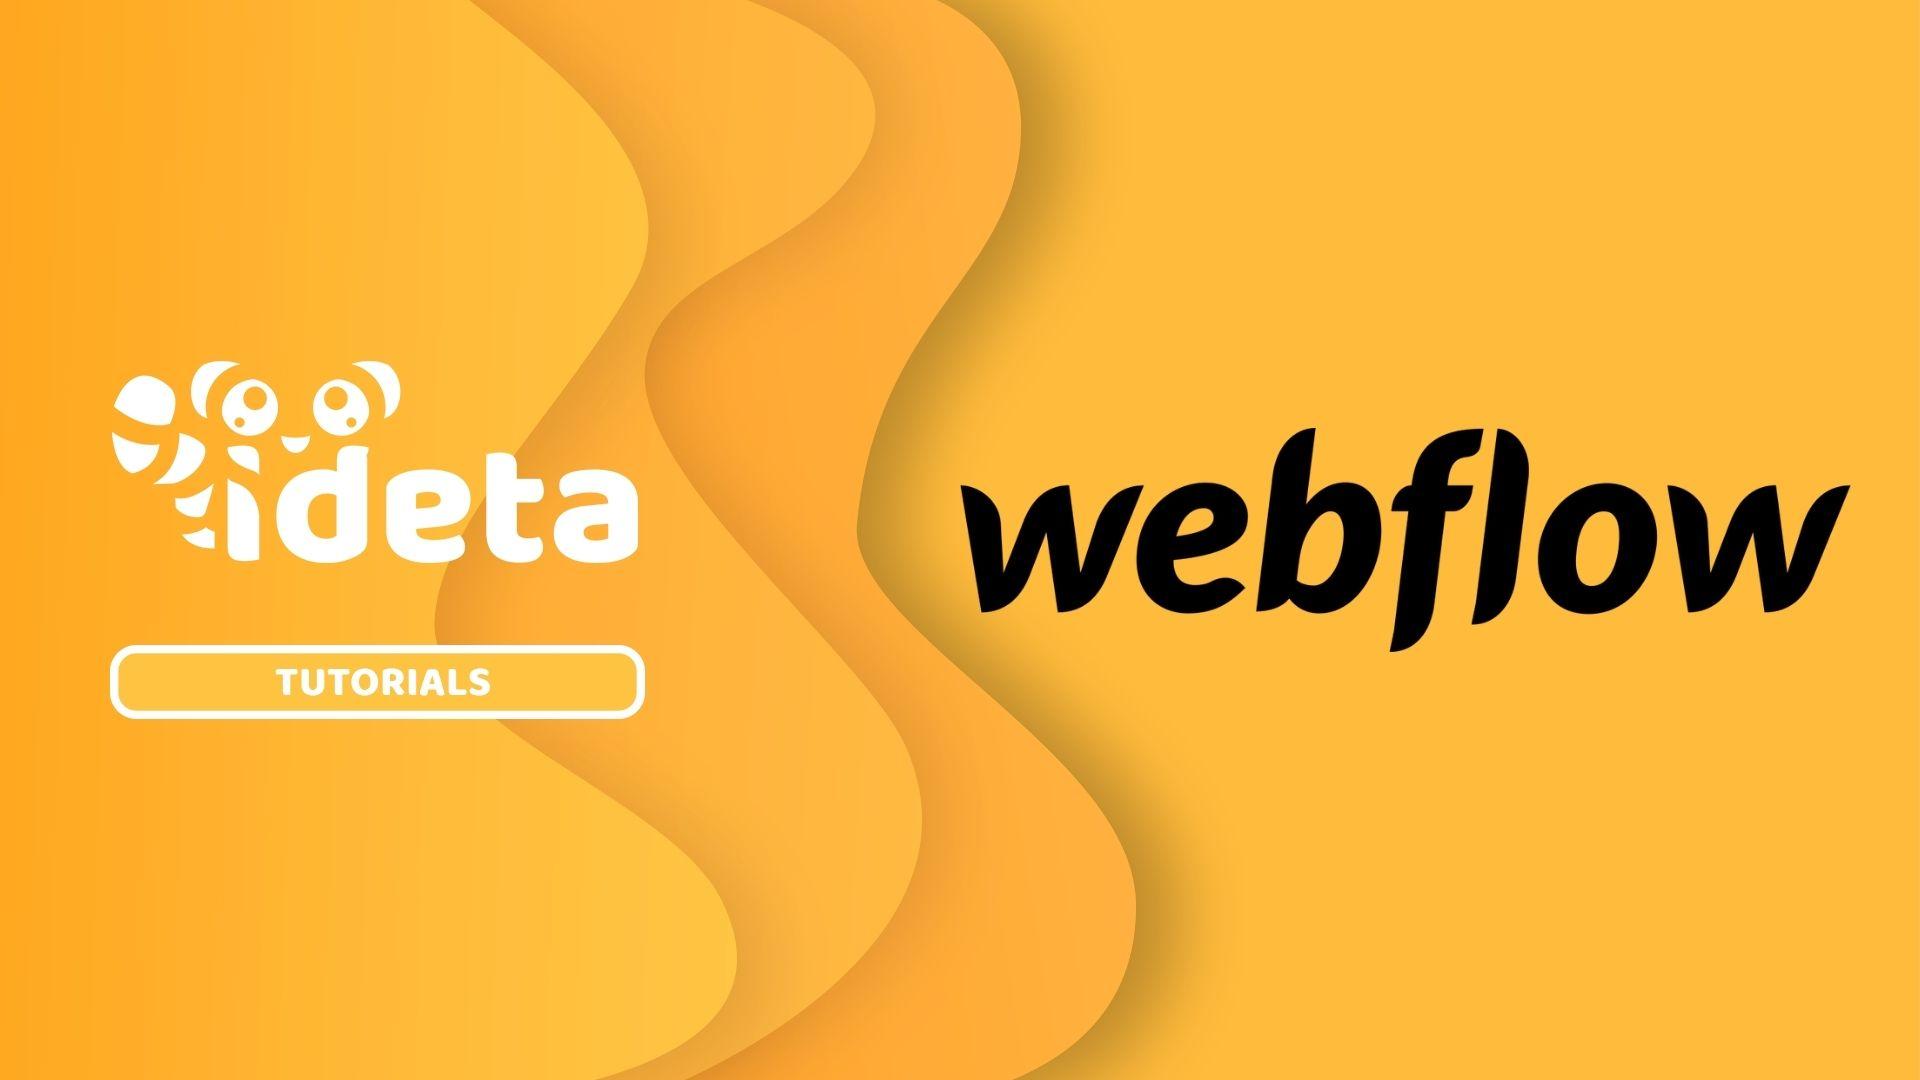 Integrate Ideta's Chatbot to Webflow